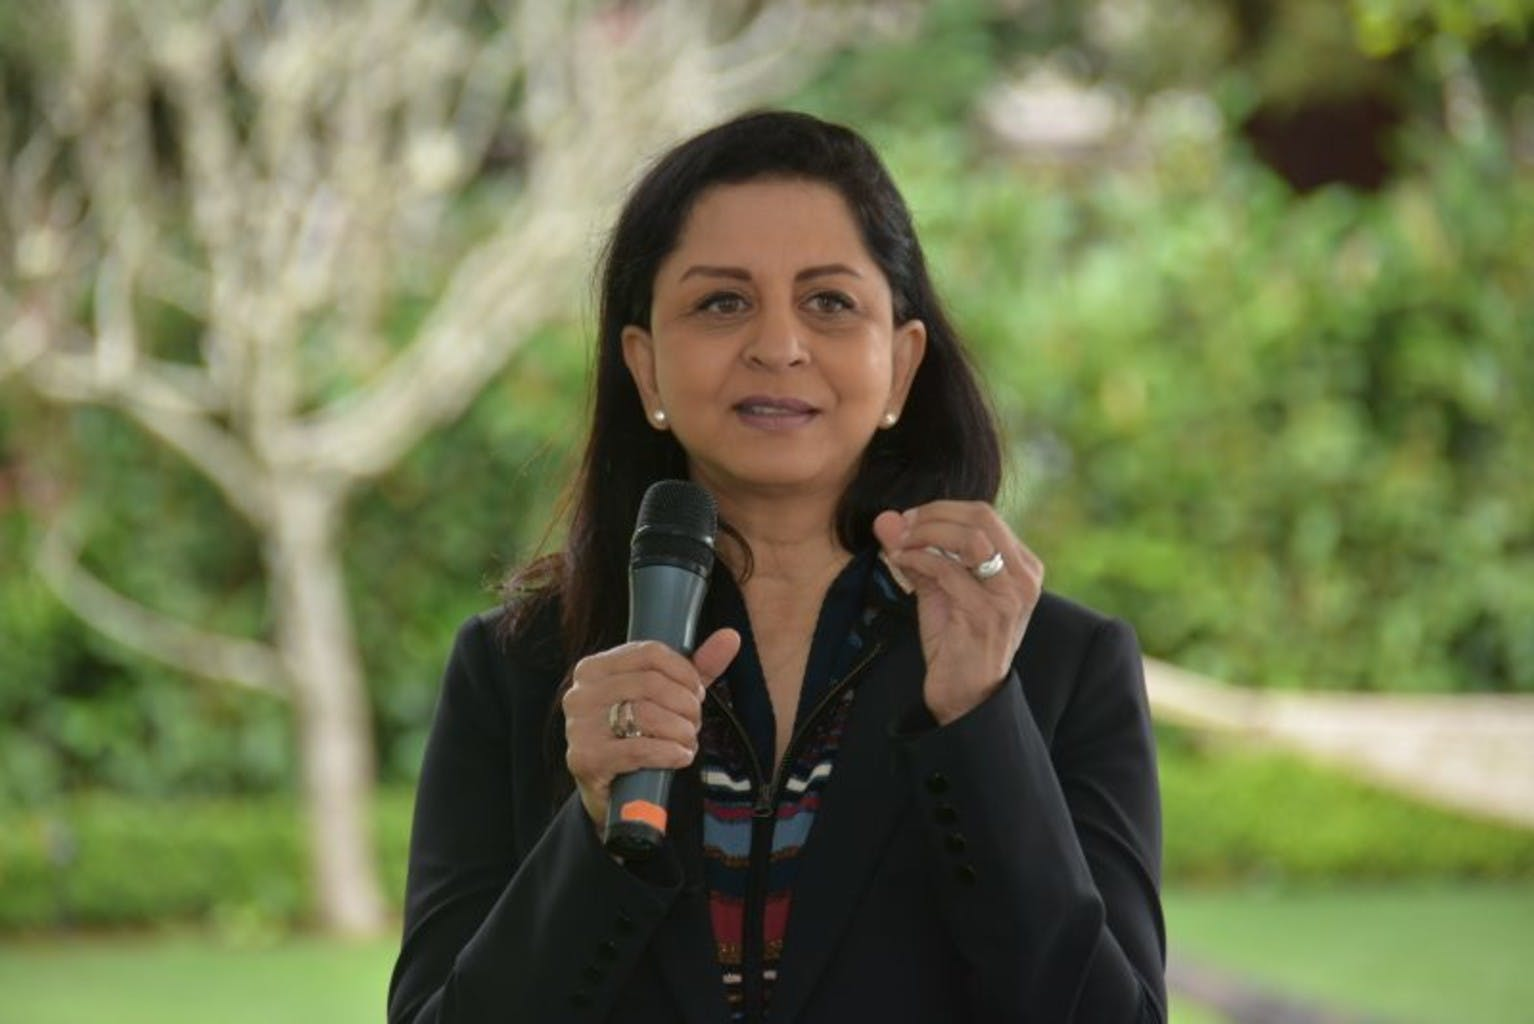 Vandana Tilak for Akshaya Patra Foundation, Seema magazine, Seema woman, entrepreneur, Indian woman entrepreneur